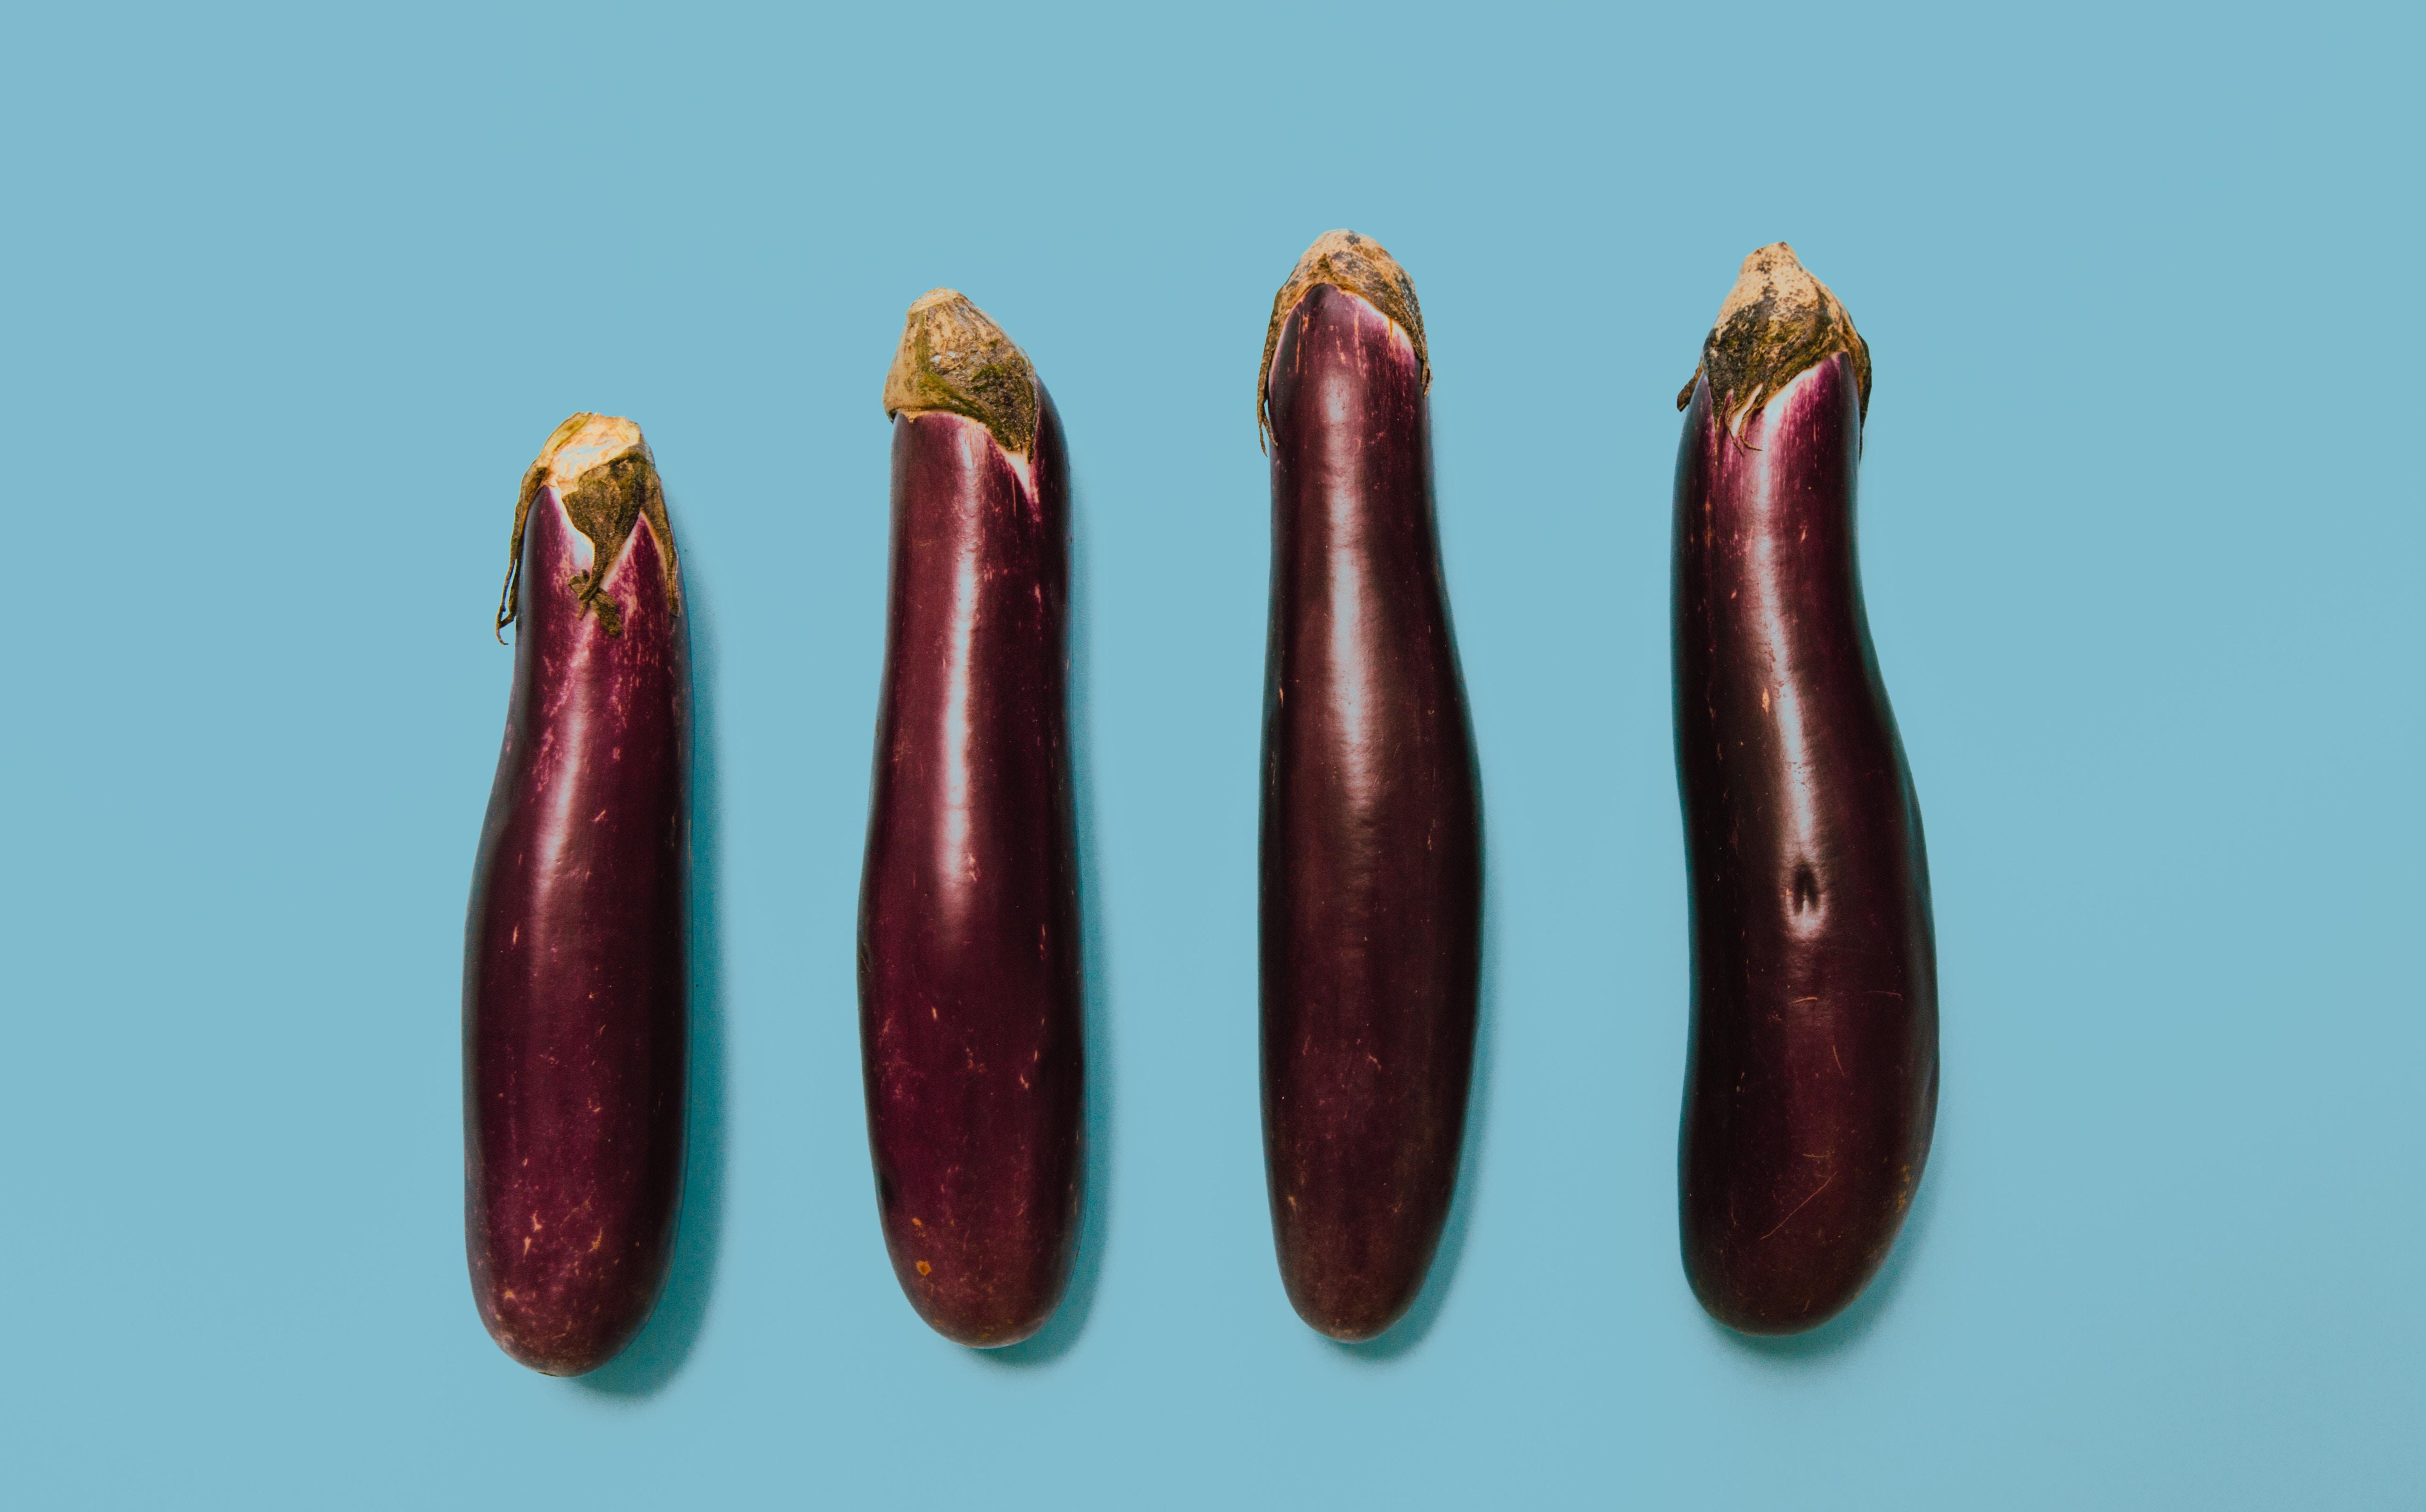 Nu mi-a crescut penisul | Forumul Medical ROmedic